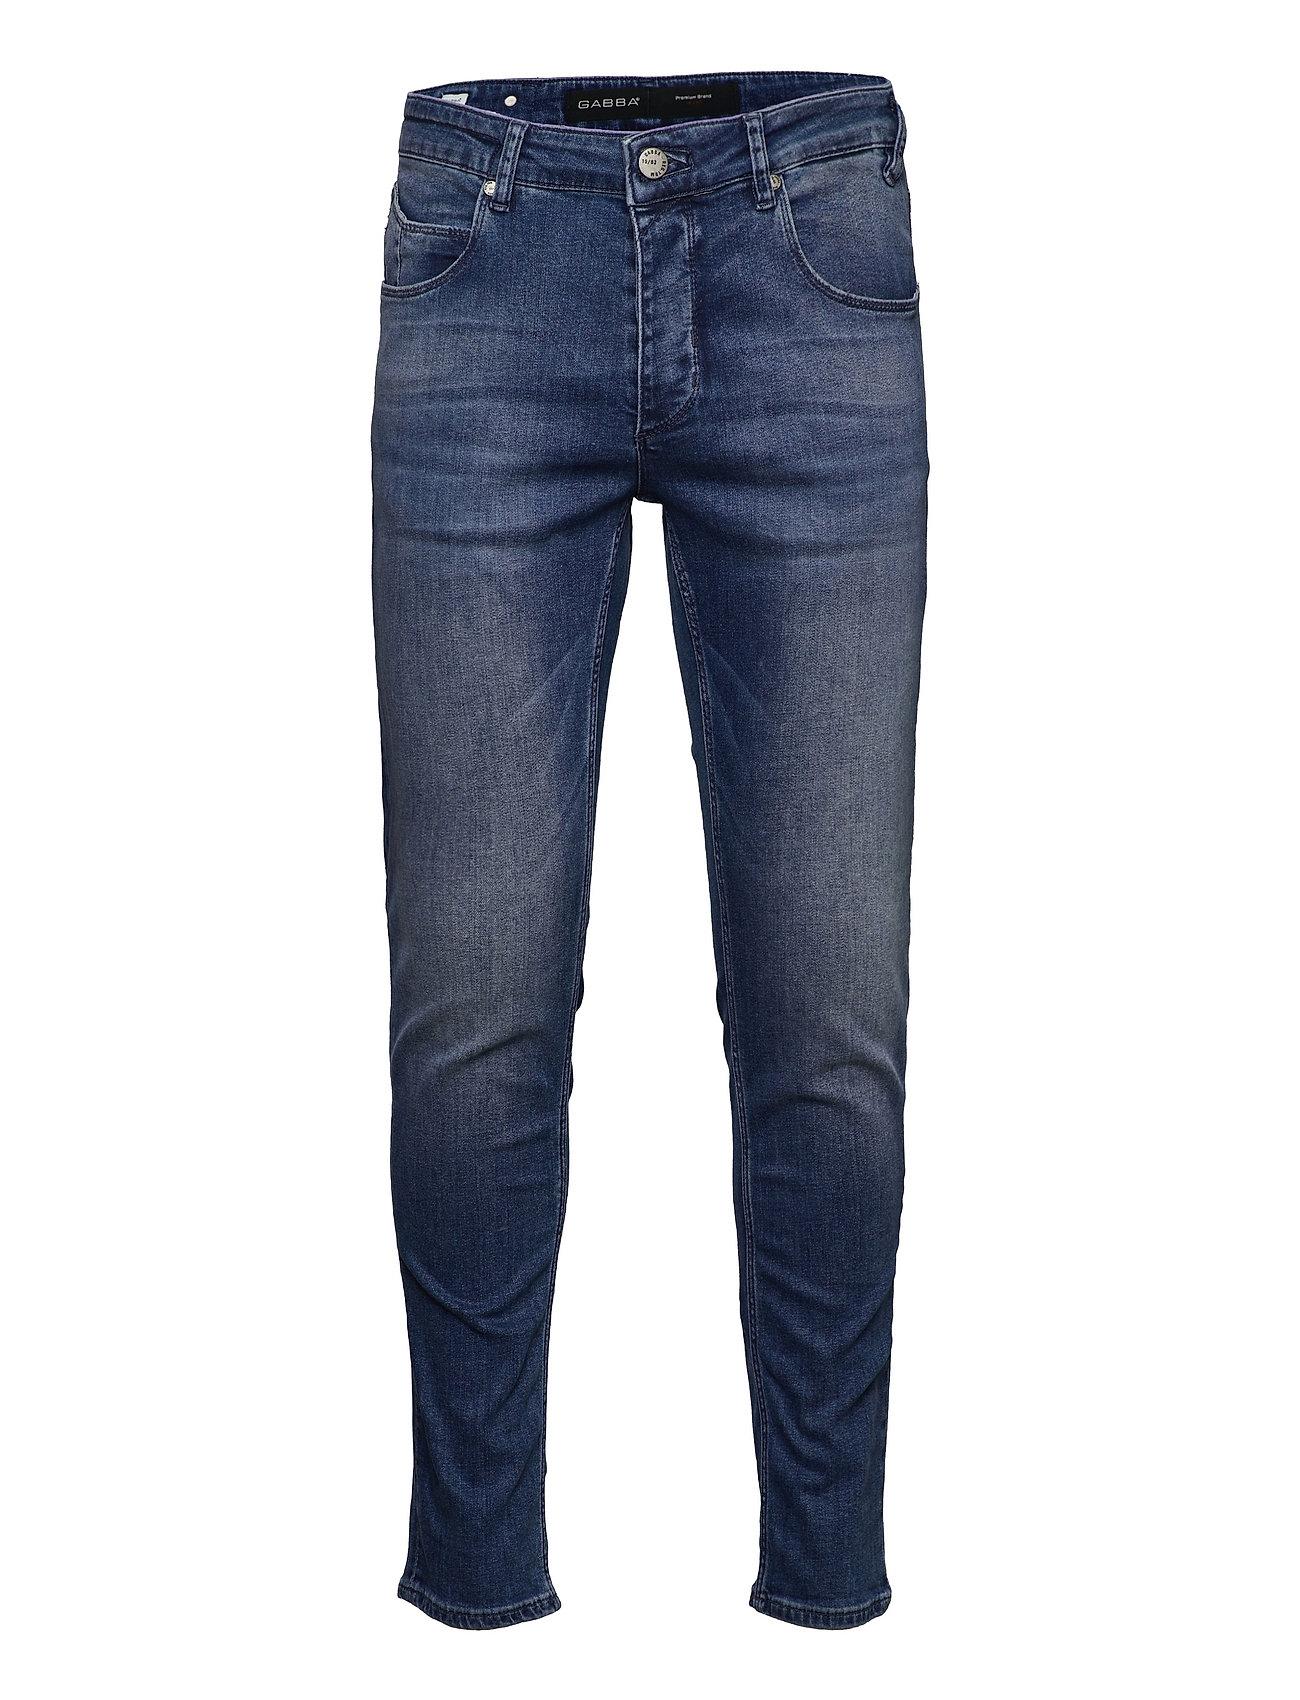 Image of Rey K3866 Jeans Slim Jeans Blå Gabba (3561167283)